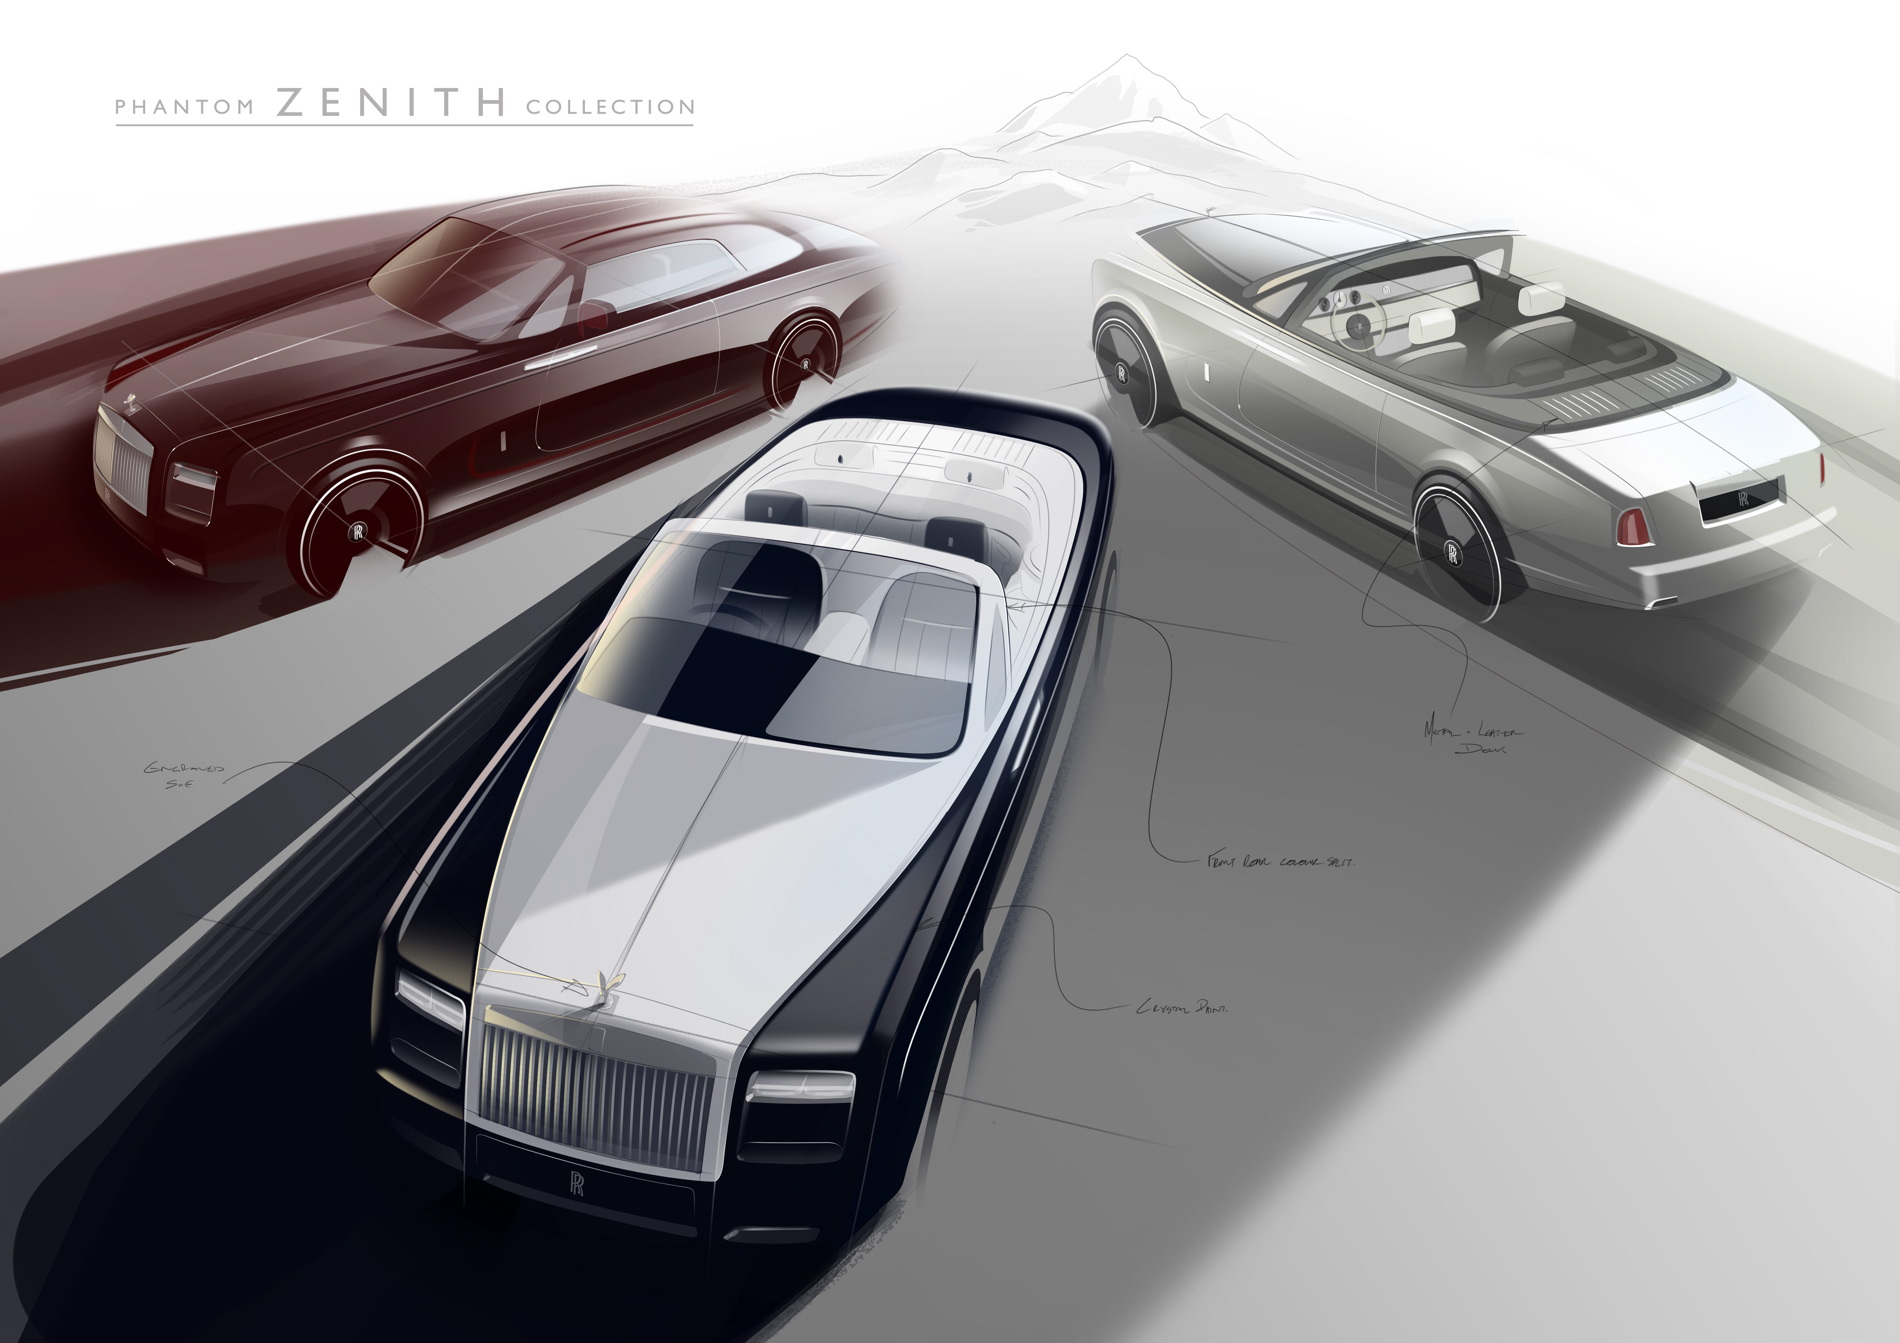 Phantom Zenith Collection 1